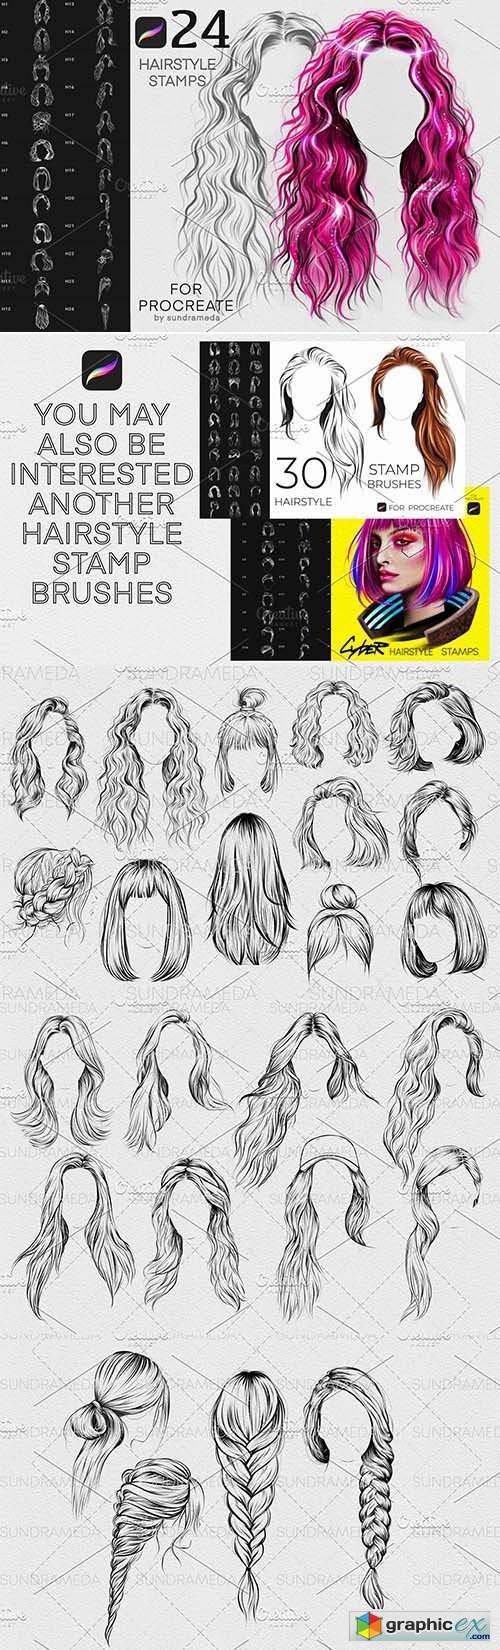 Hairstyle II Stamp Brushes Procreate